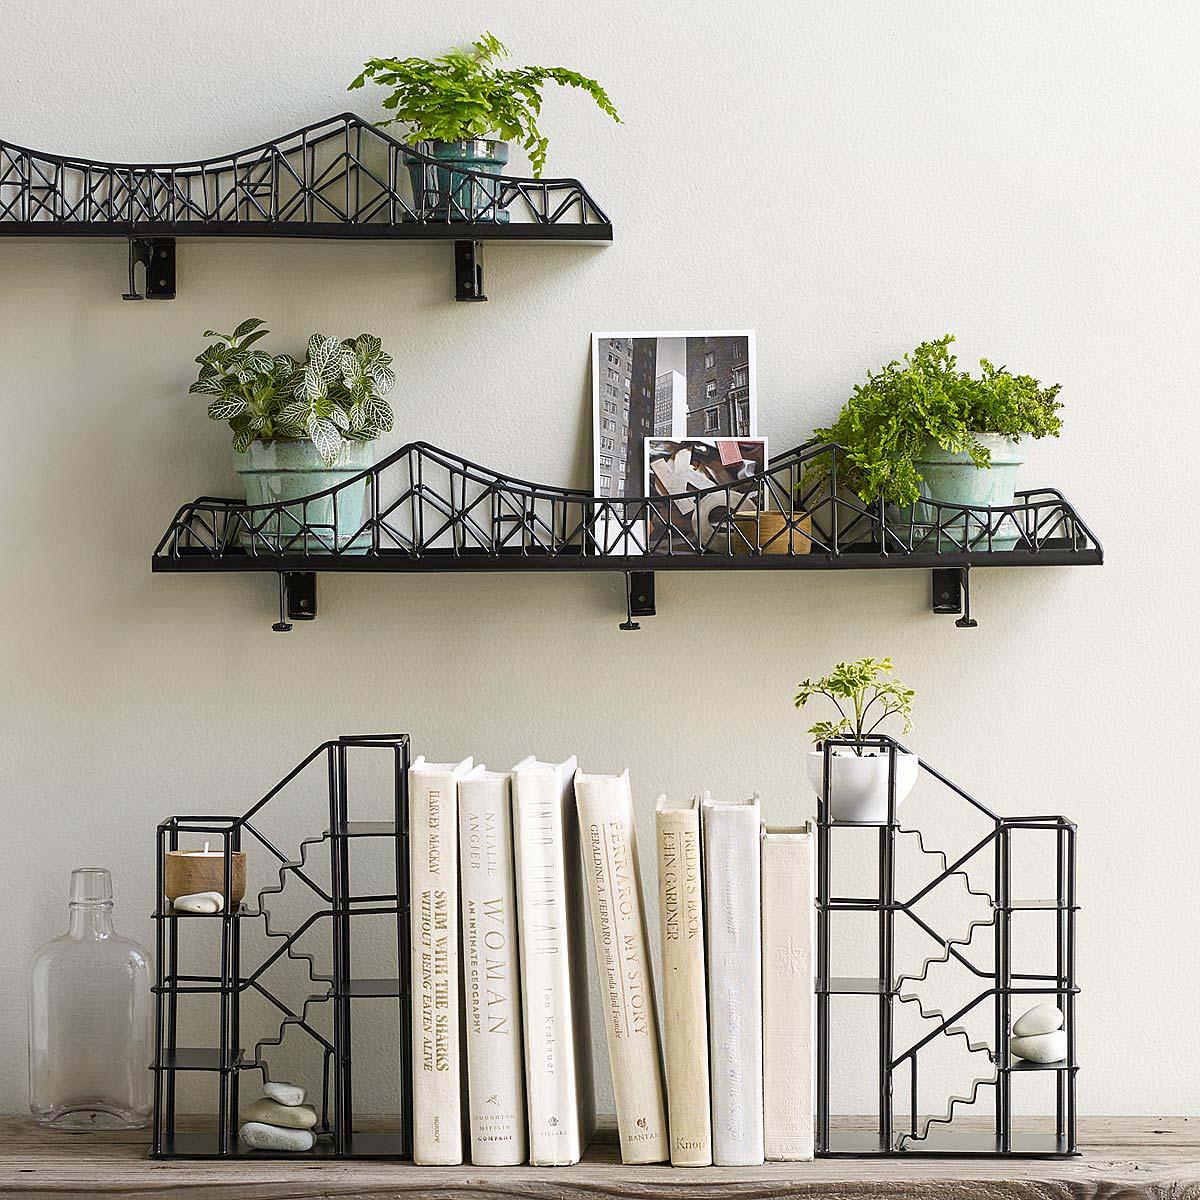 Decorative Metal Gate Hardware Suspension Bridge Shelf   metal shelving   UncommonGoods